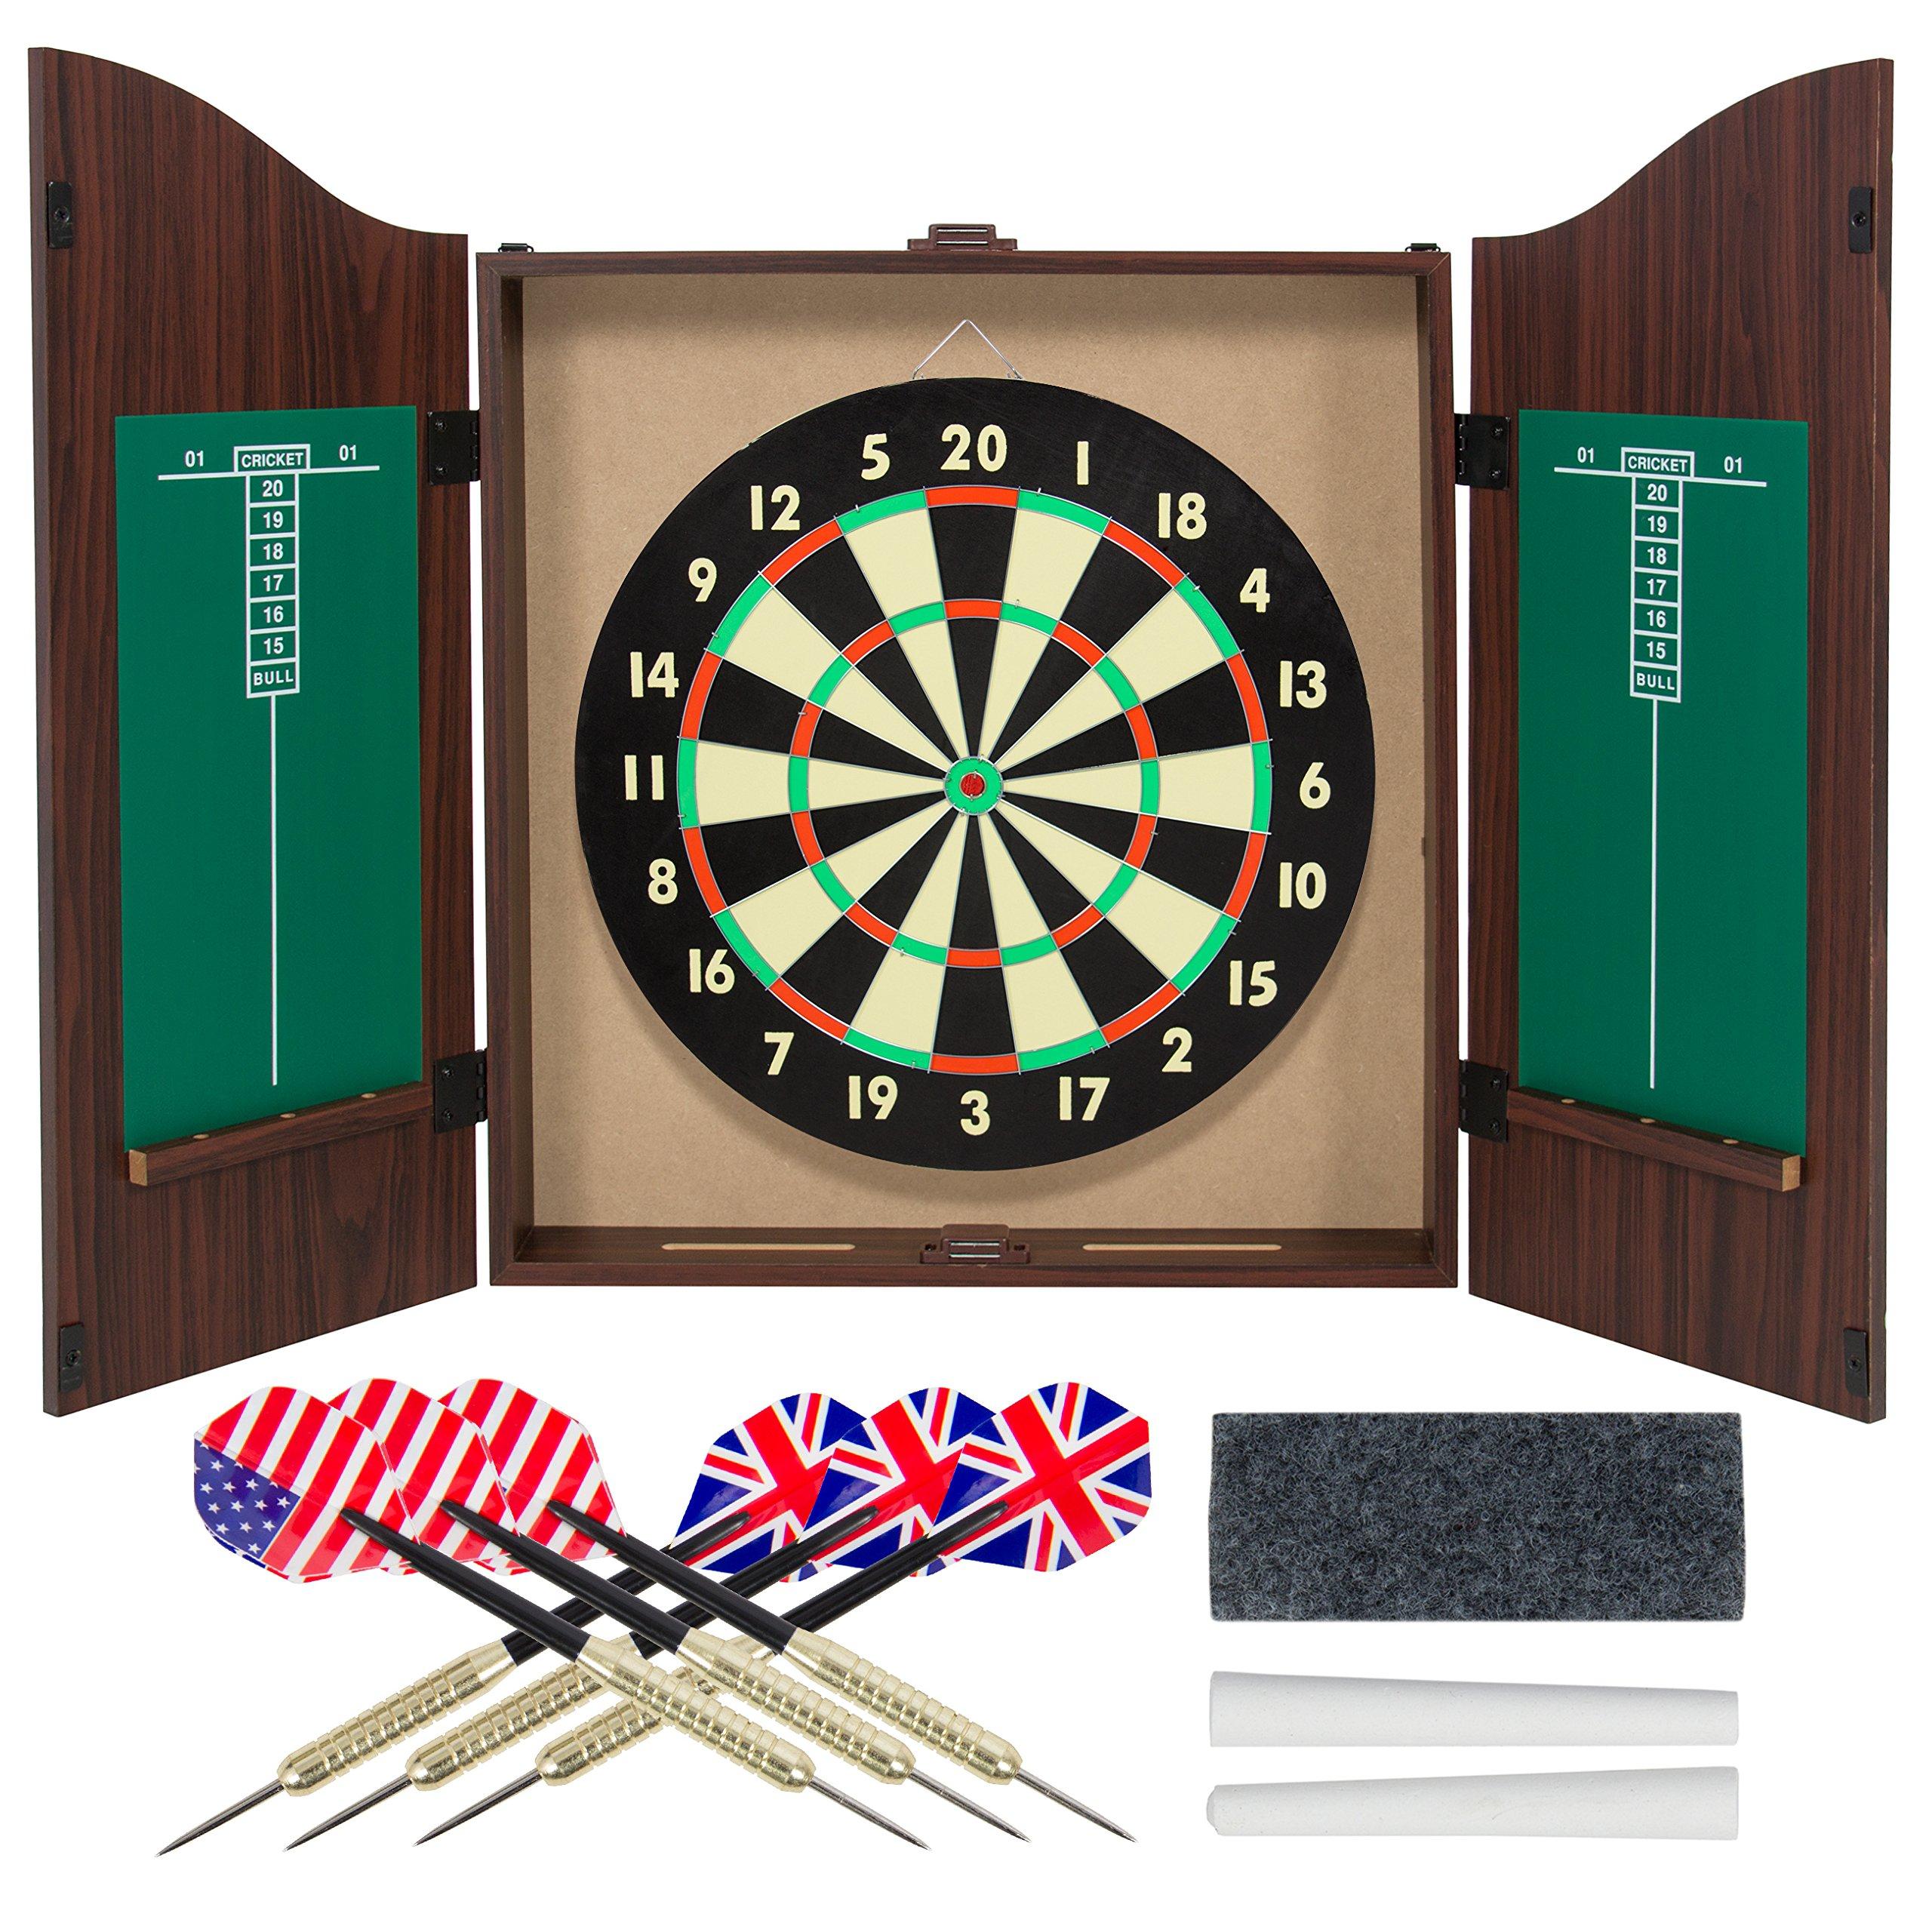 Gameroom Dartboard Cabinet Set with Realistic Walnut Finish